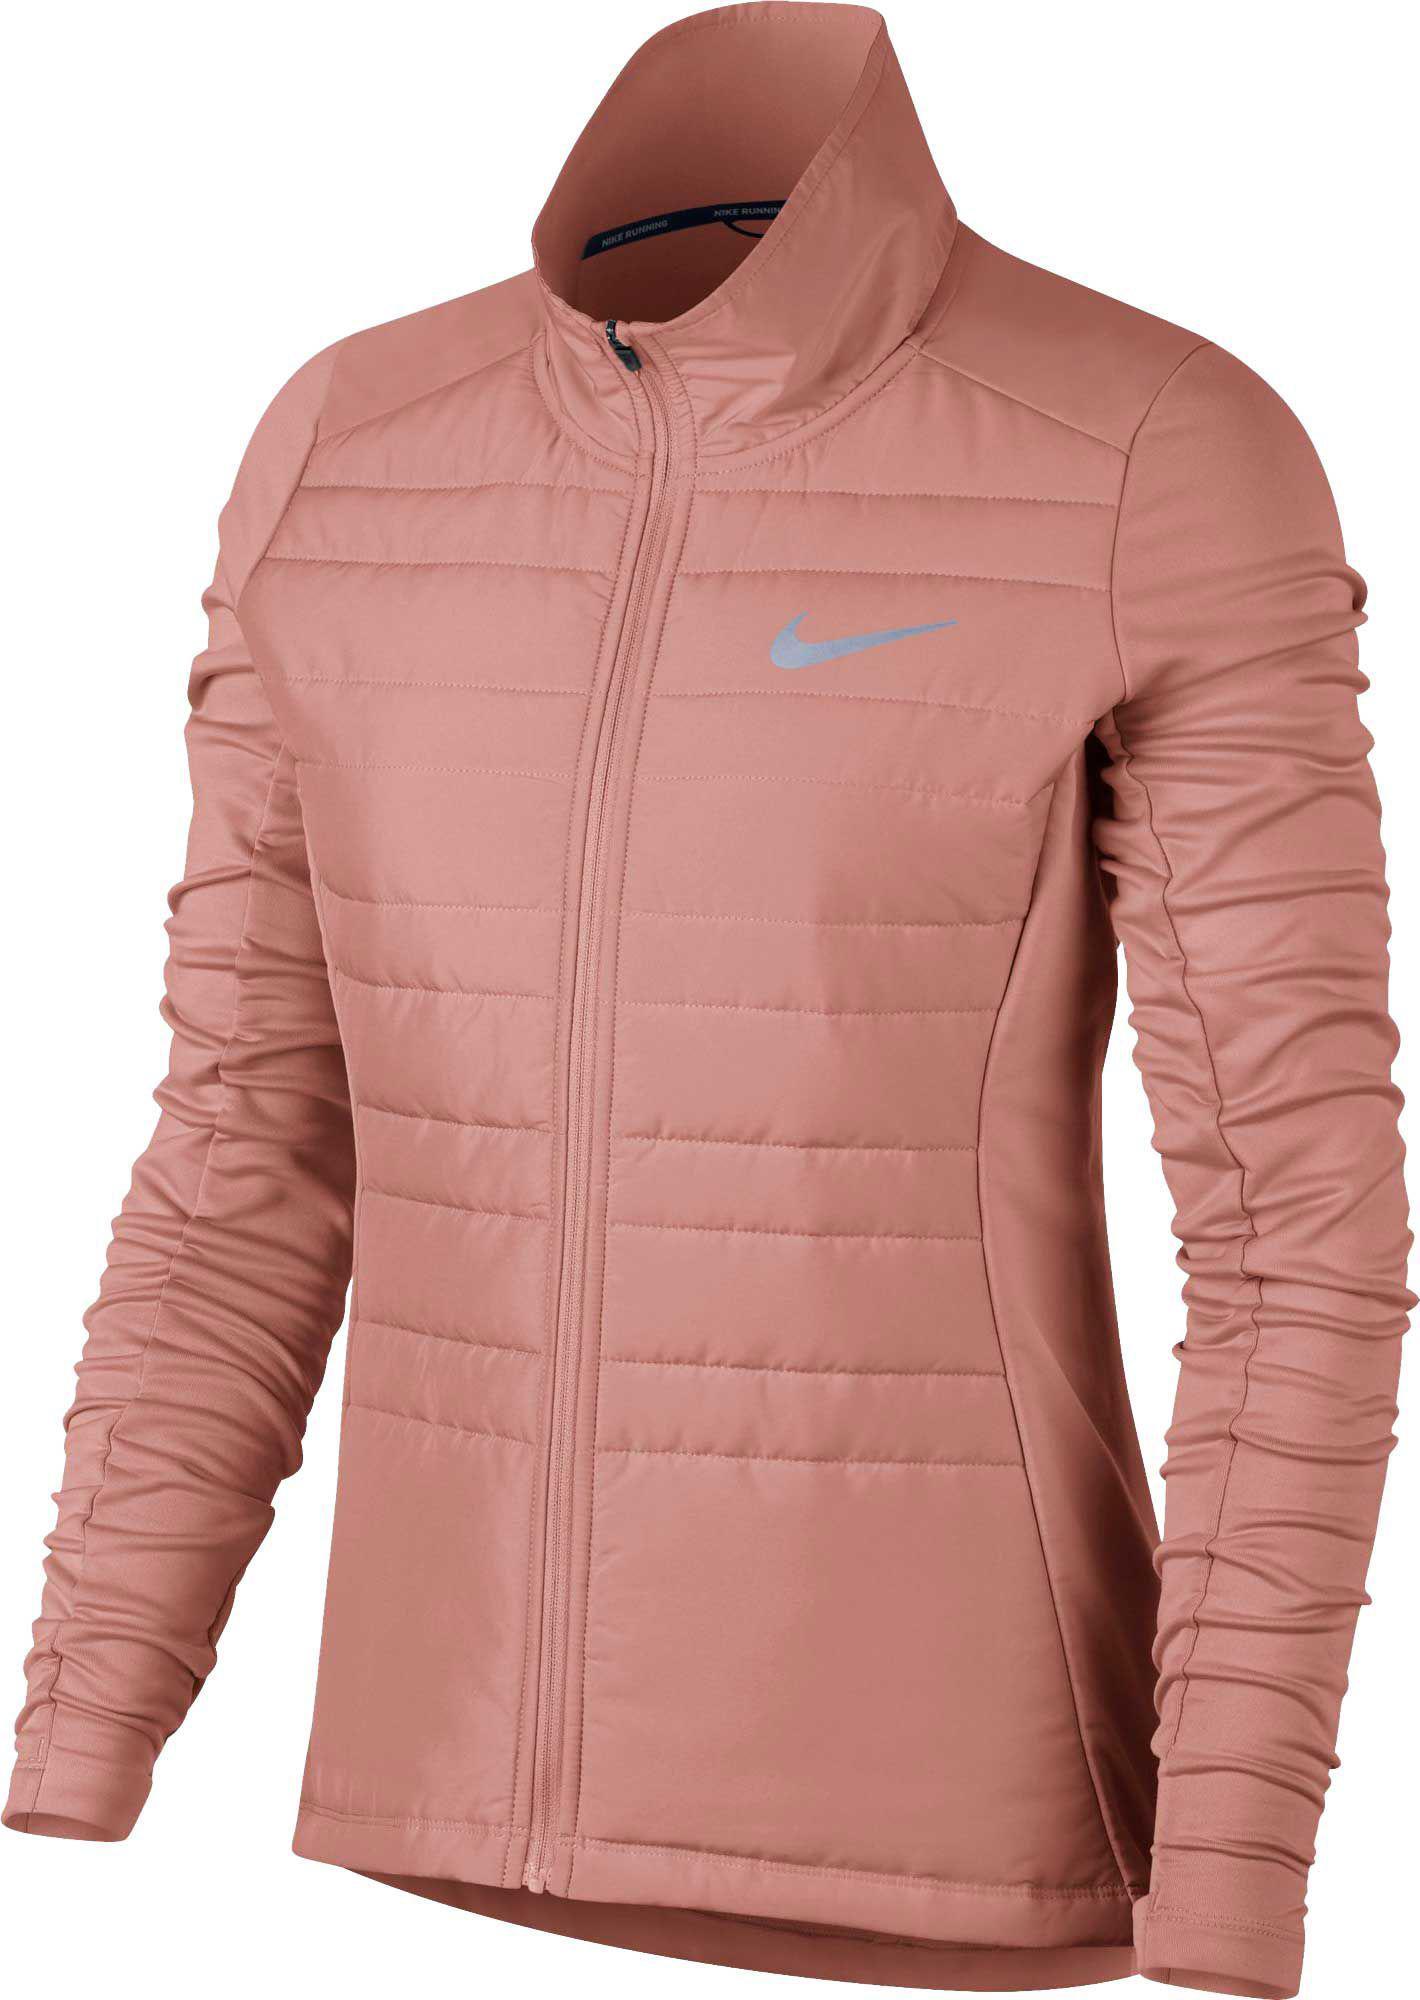 8c3cb74f1cab Lyst - Nike Essential Full Zip Running Jacket in Pink